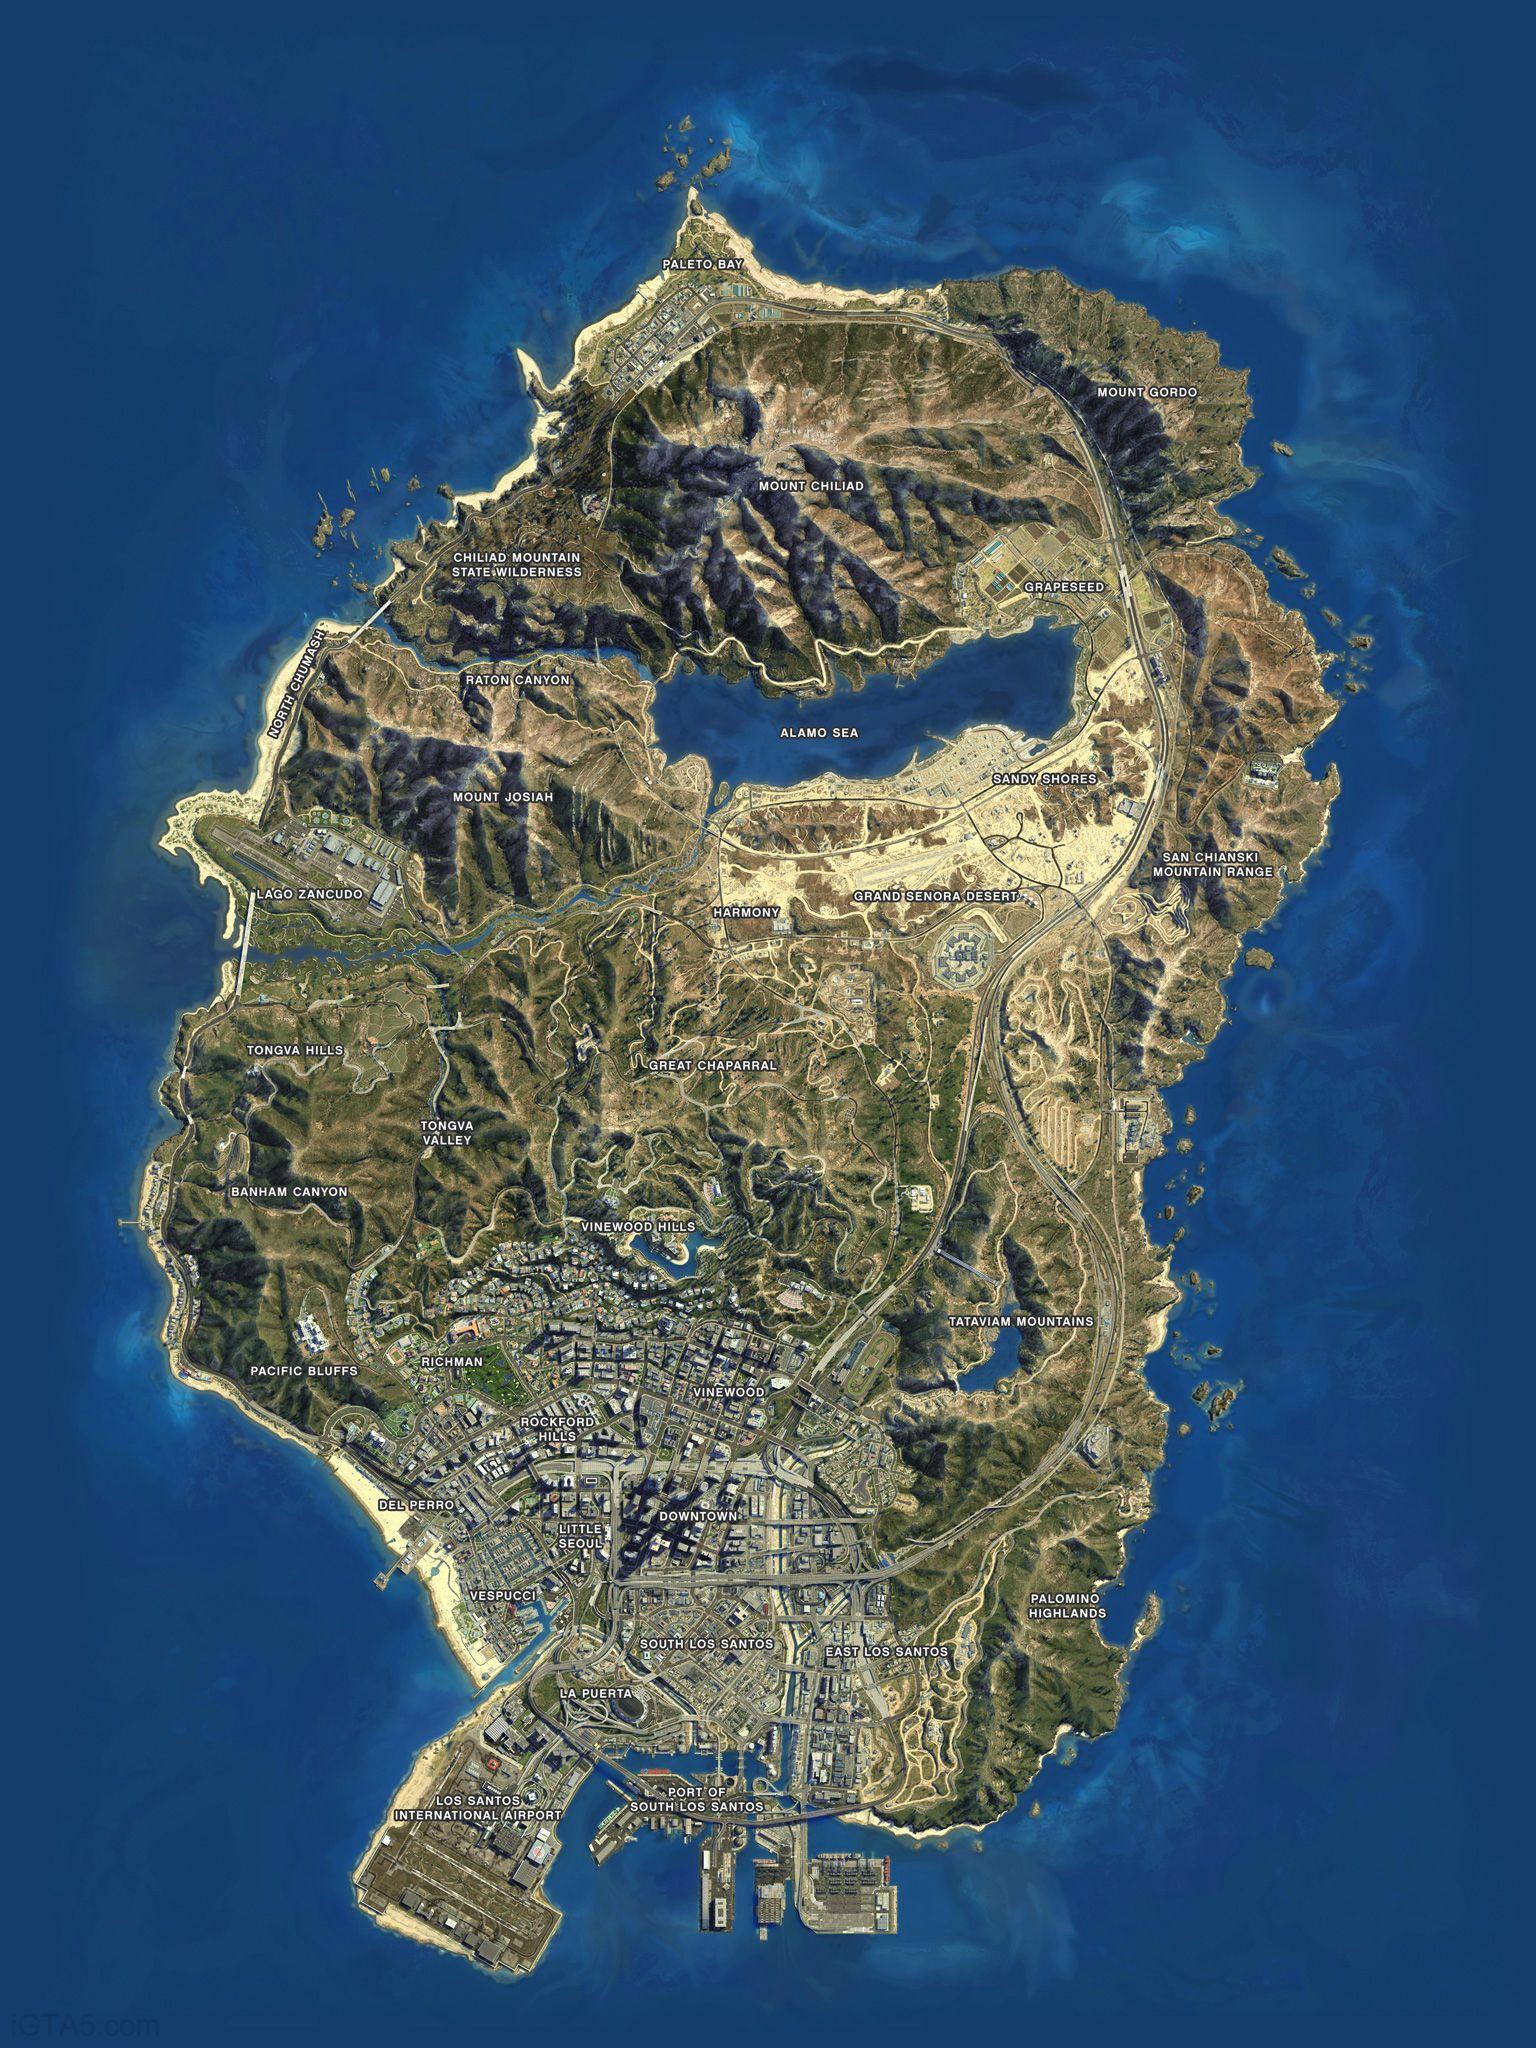 u201c This impressively detailed false aerial map